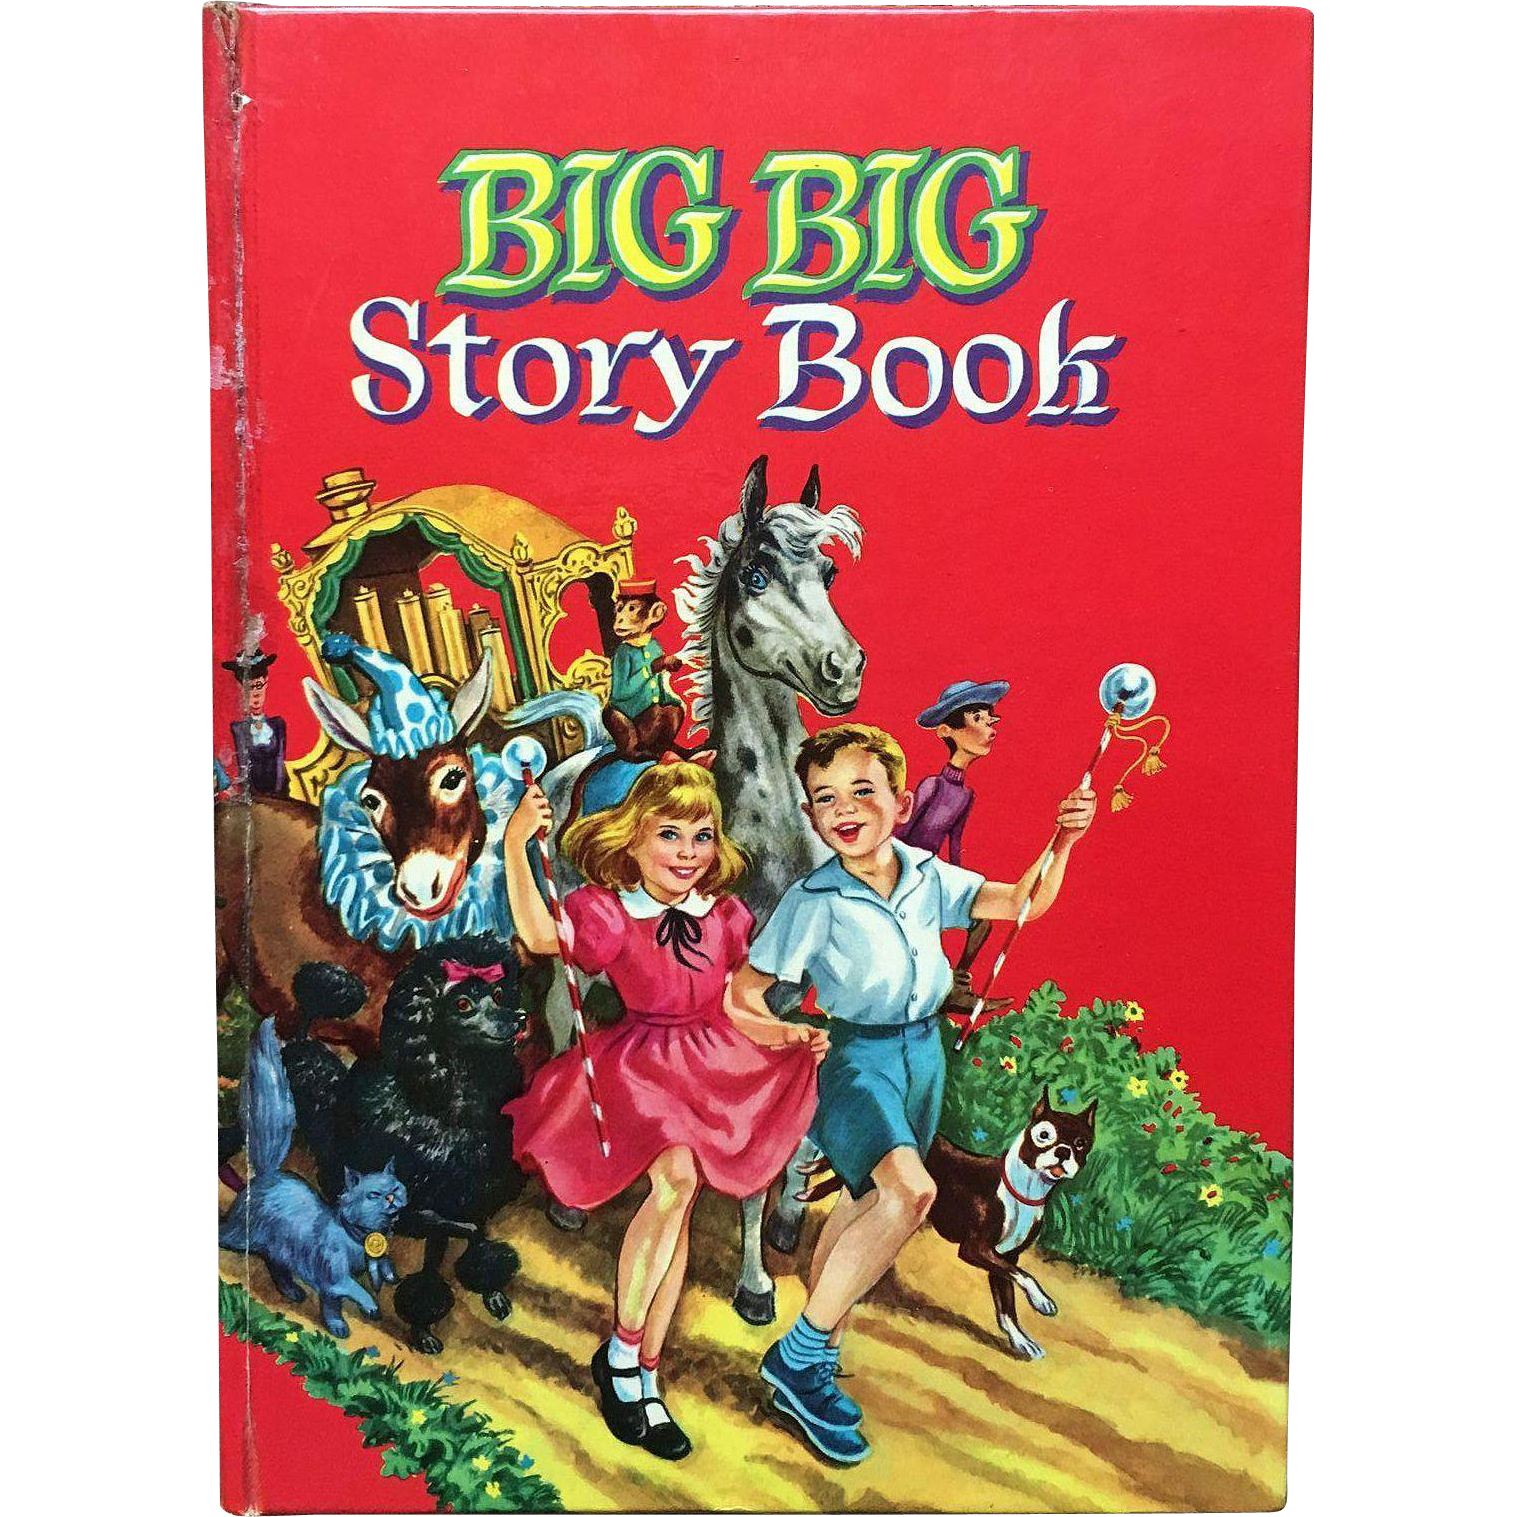 1955 Whitman Big Big Story Book